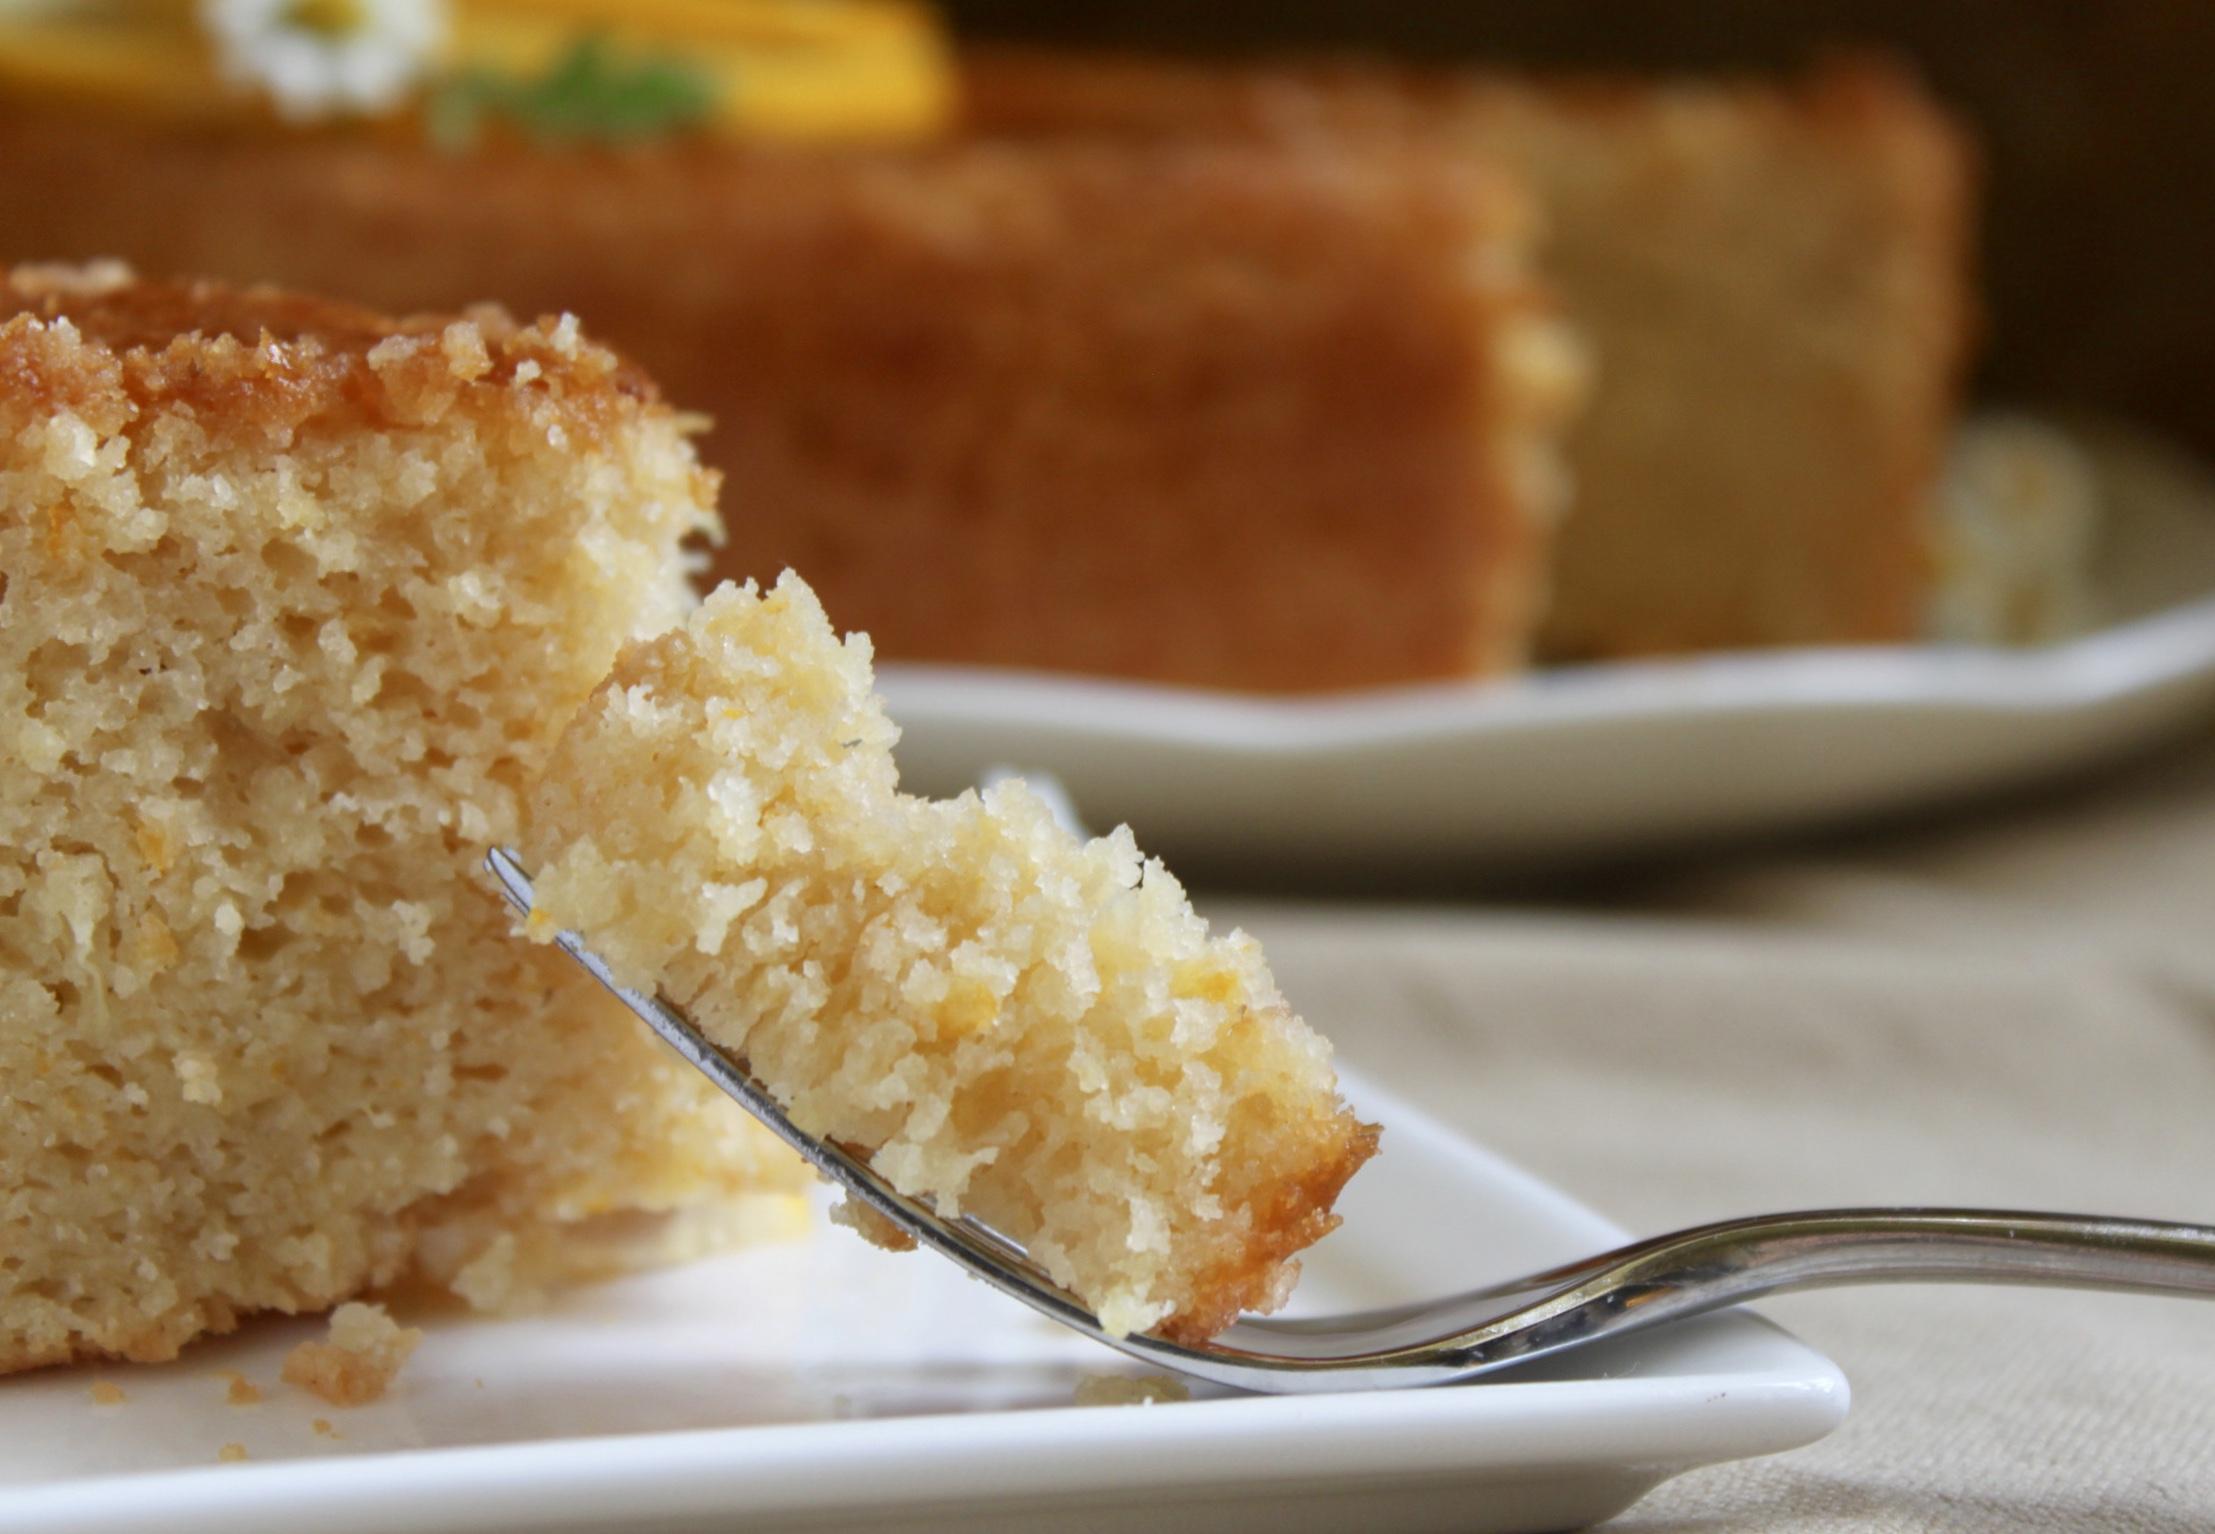 piece of gluten free lemon cake on a fork